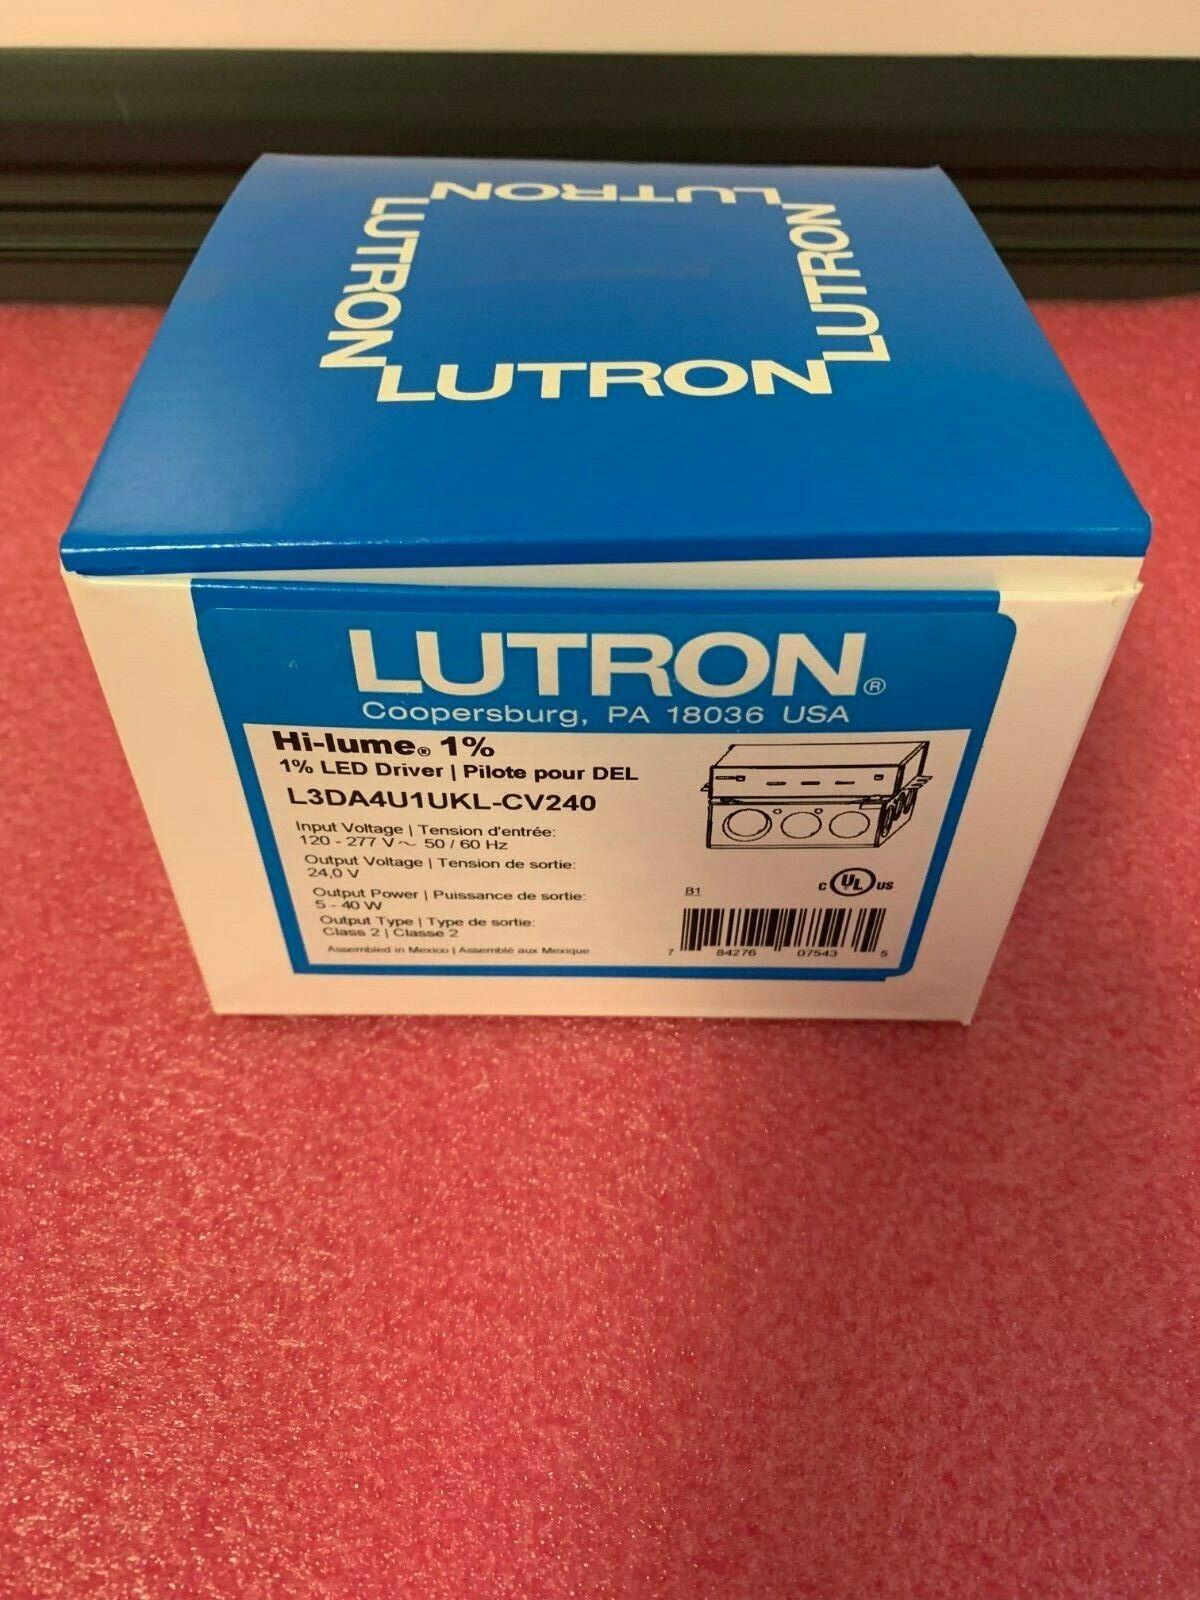 Lutron Hi-lume L3DA4U1UKL-CV240 1 percent Dimming Led Driver